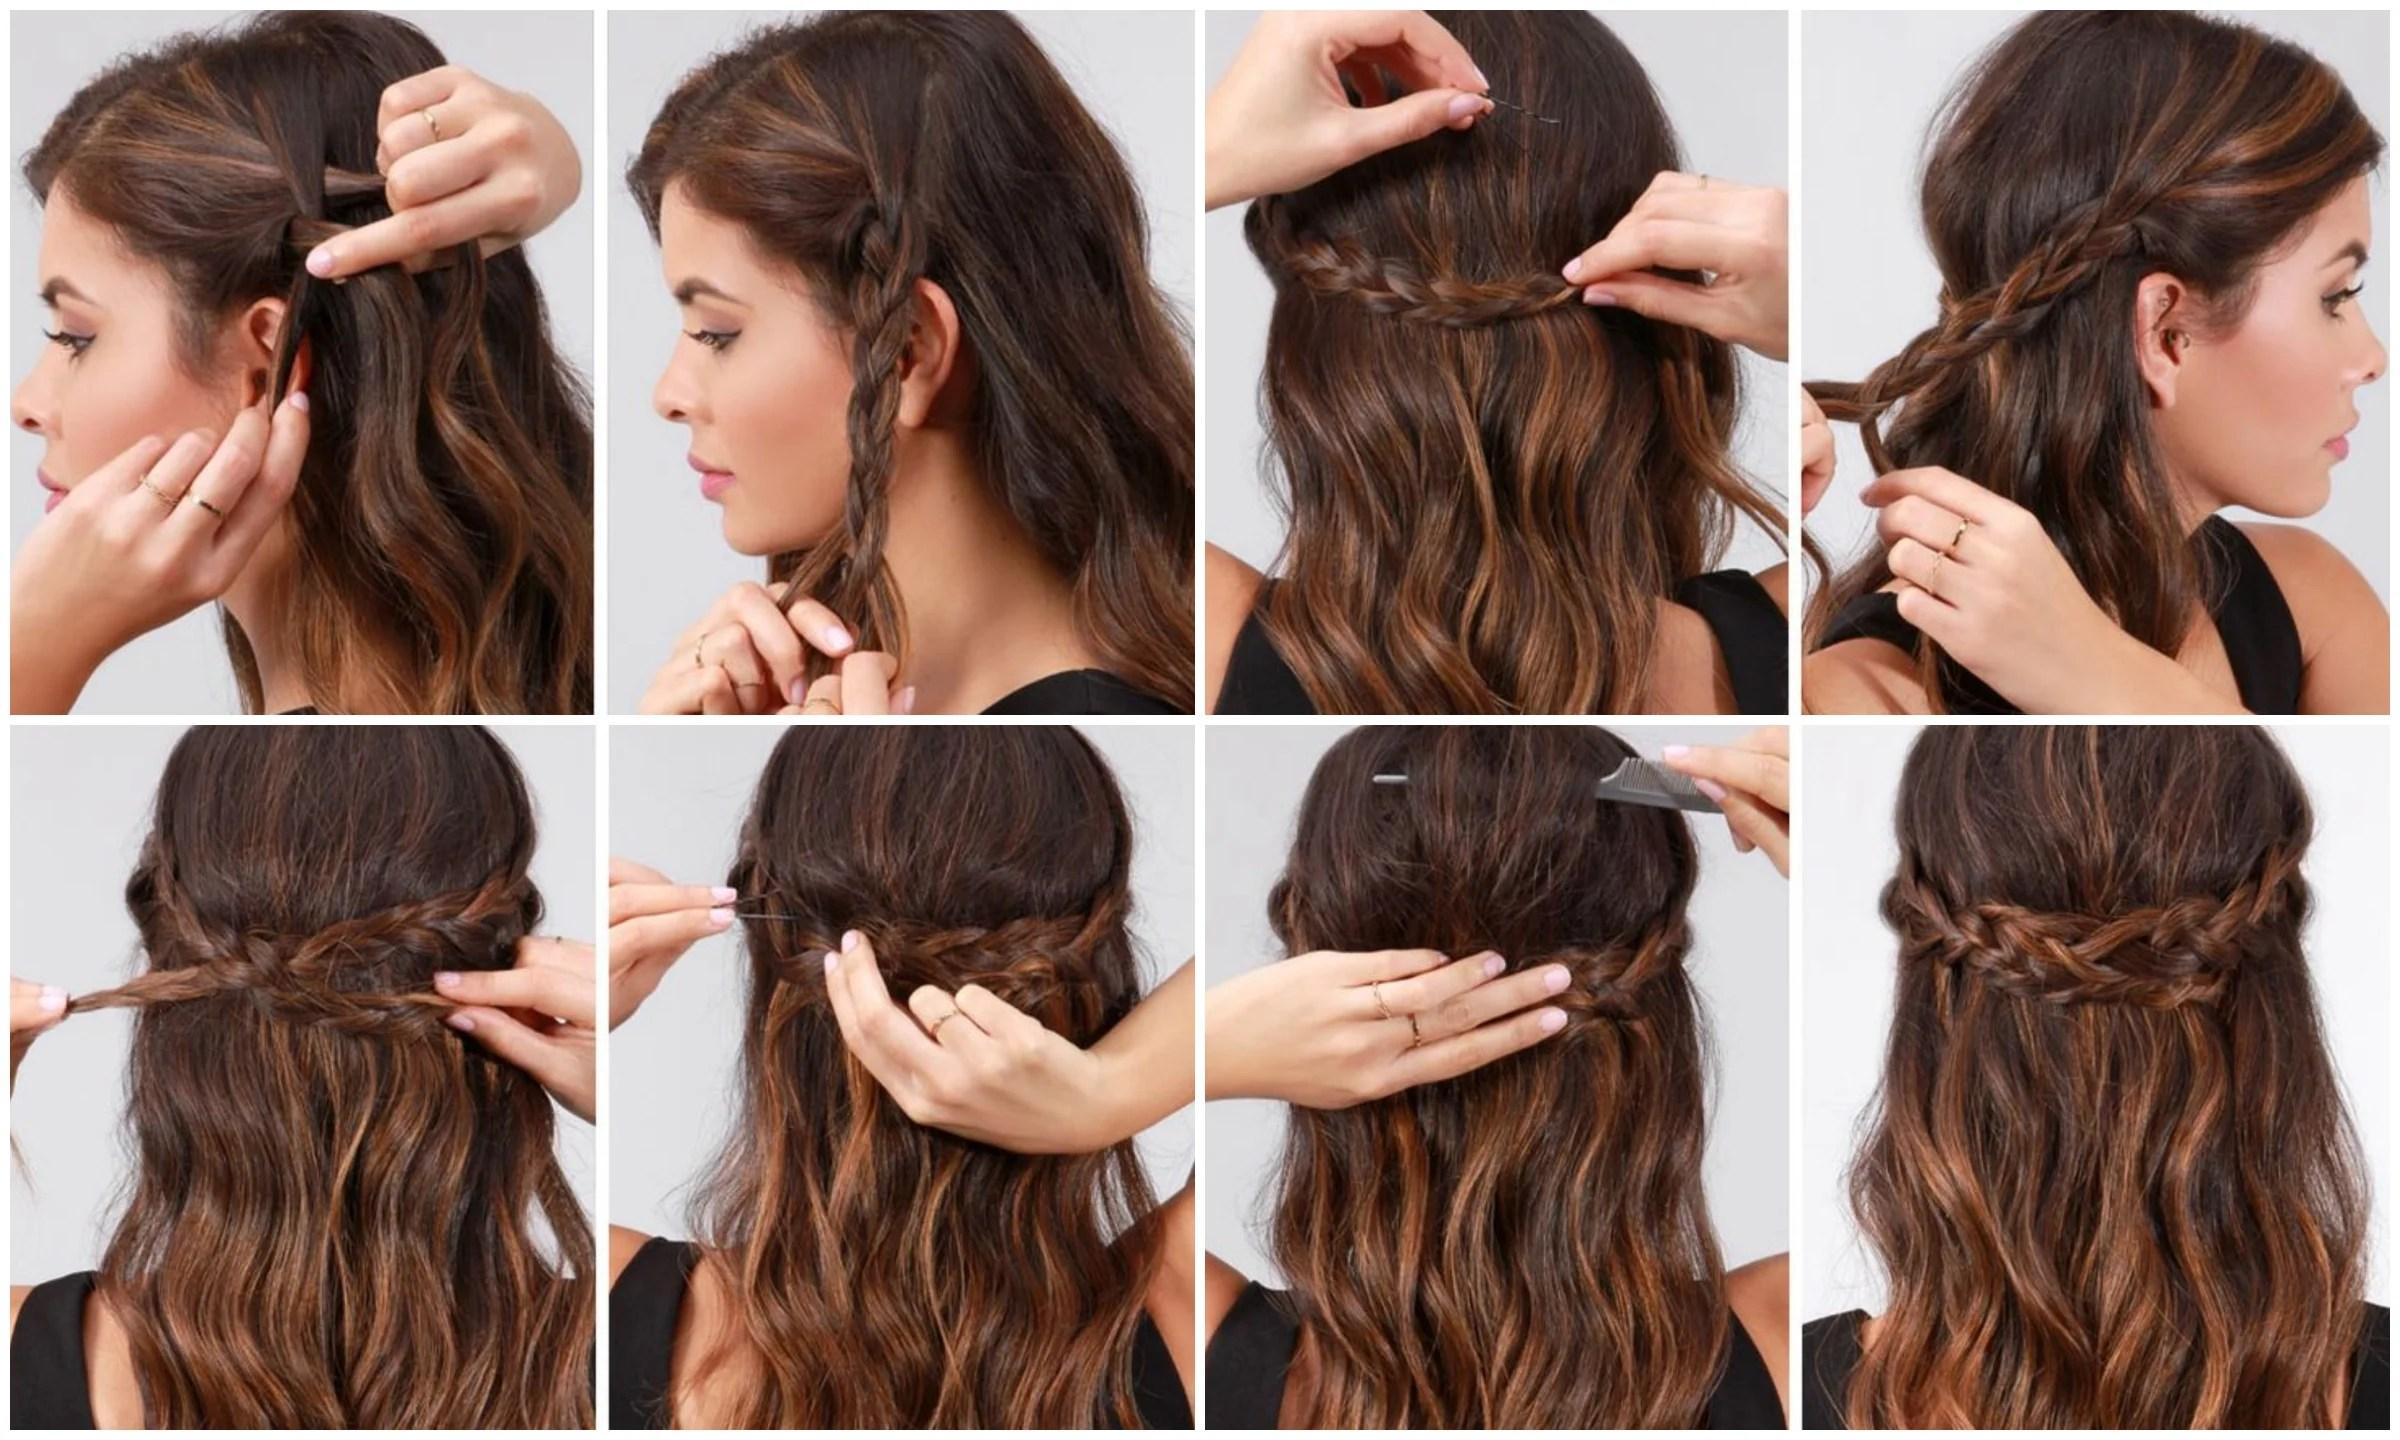 15 Peinados Faciles Para Bodas Pelo Rizado Las Mejores